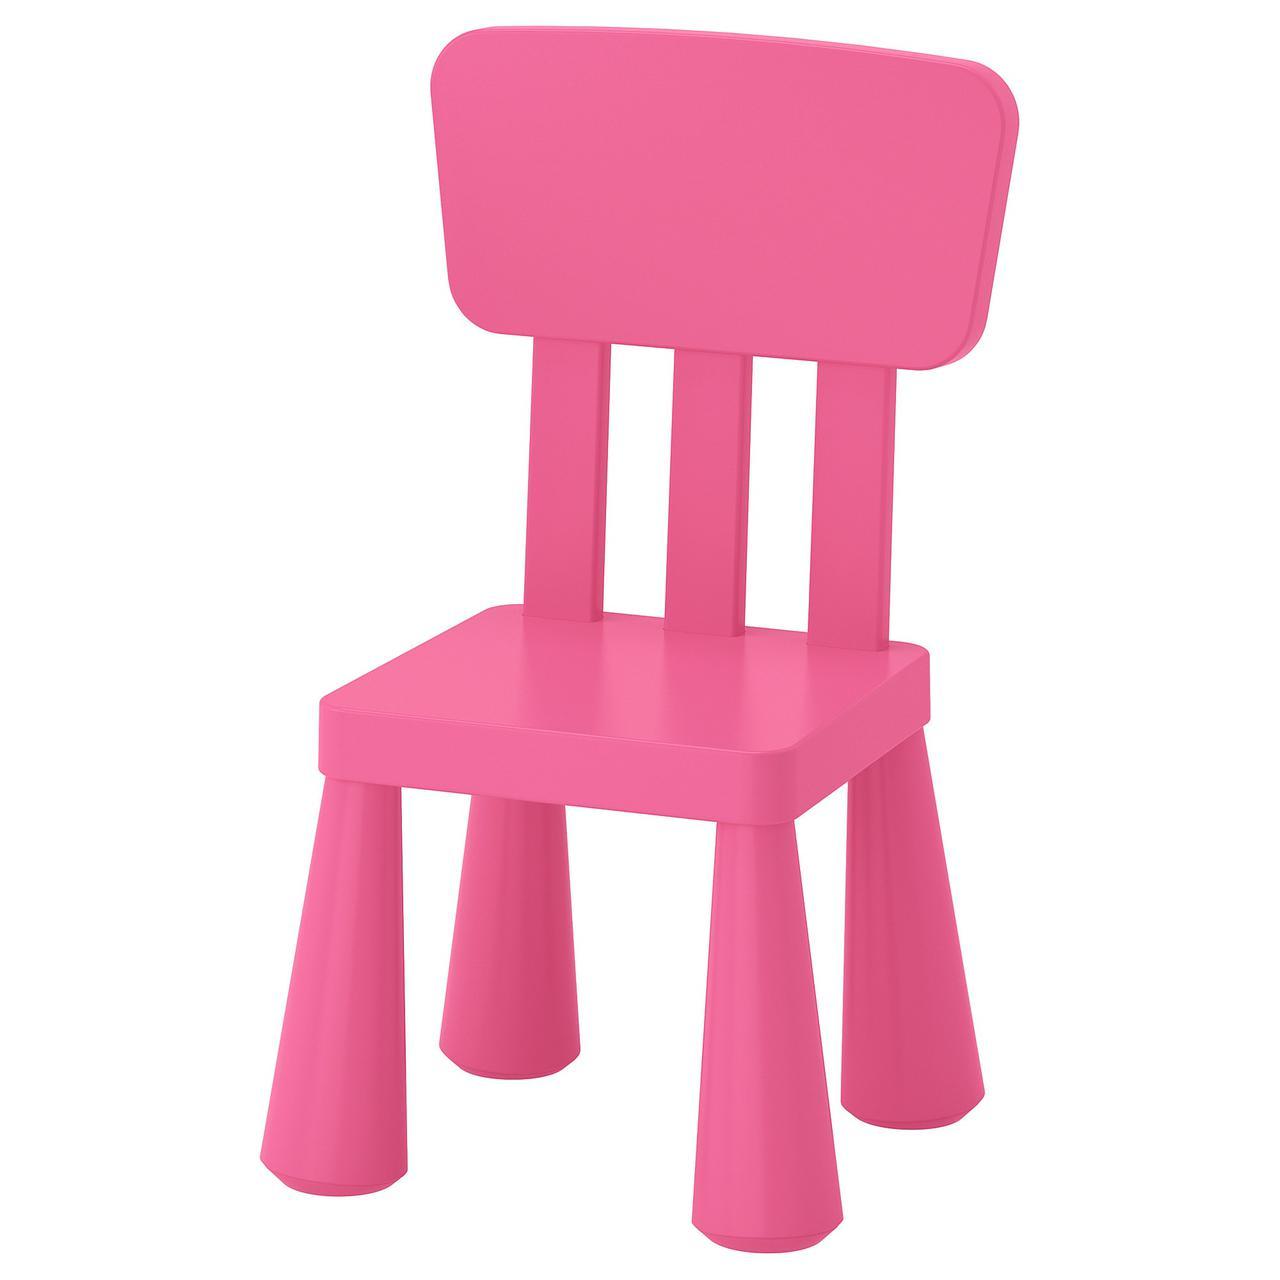 ✅ IKEA MAMMUT (803.823.21) Детский стул, розовый